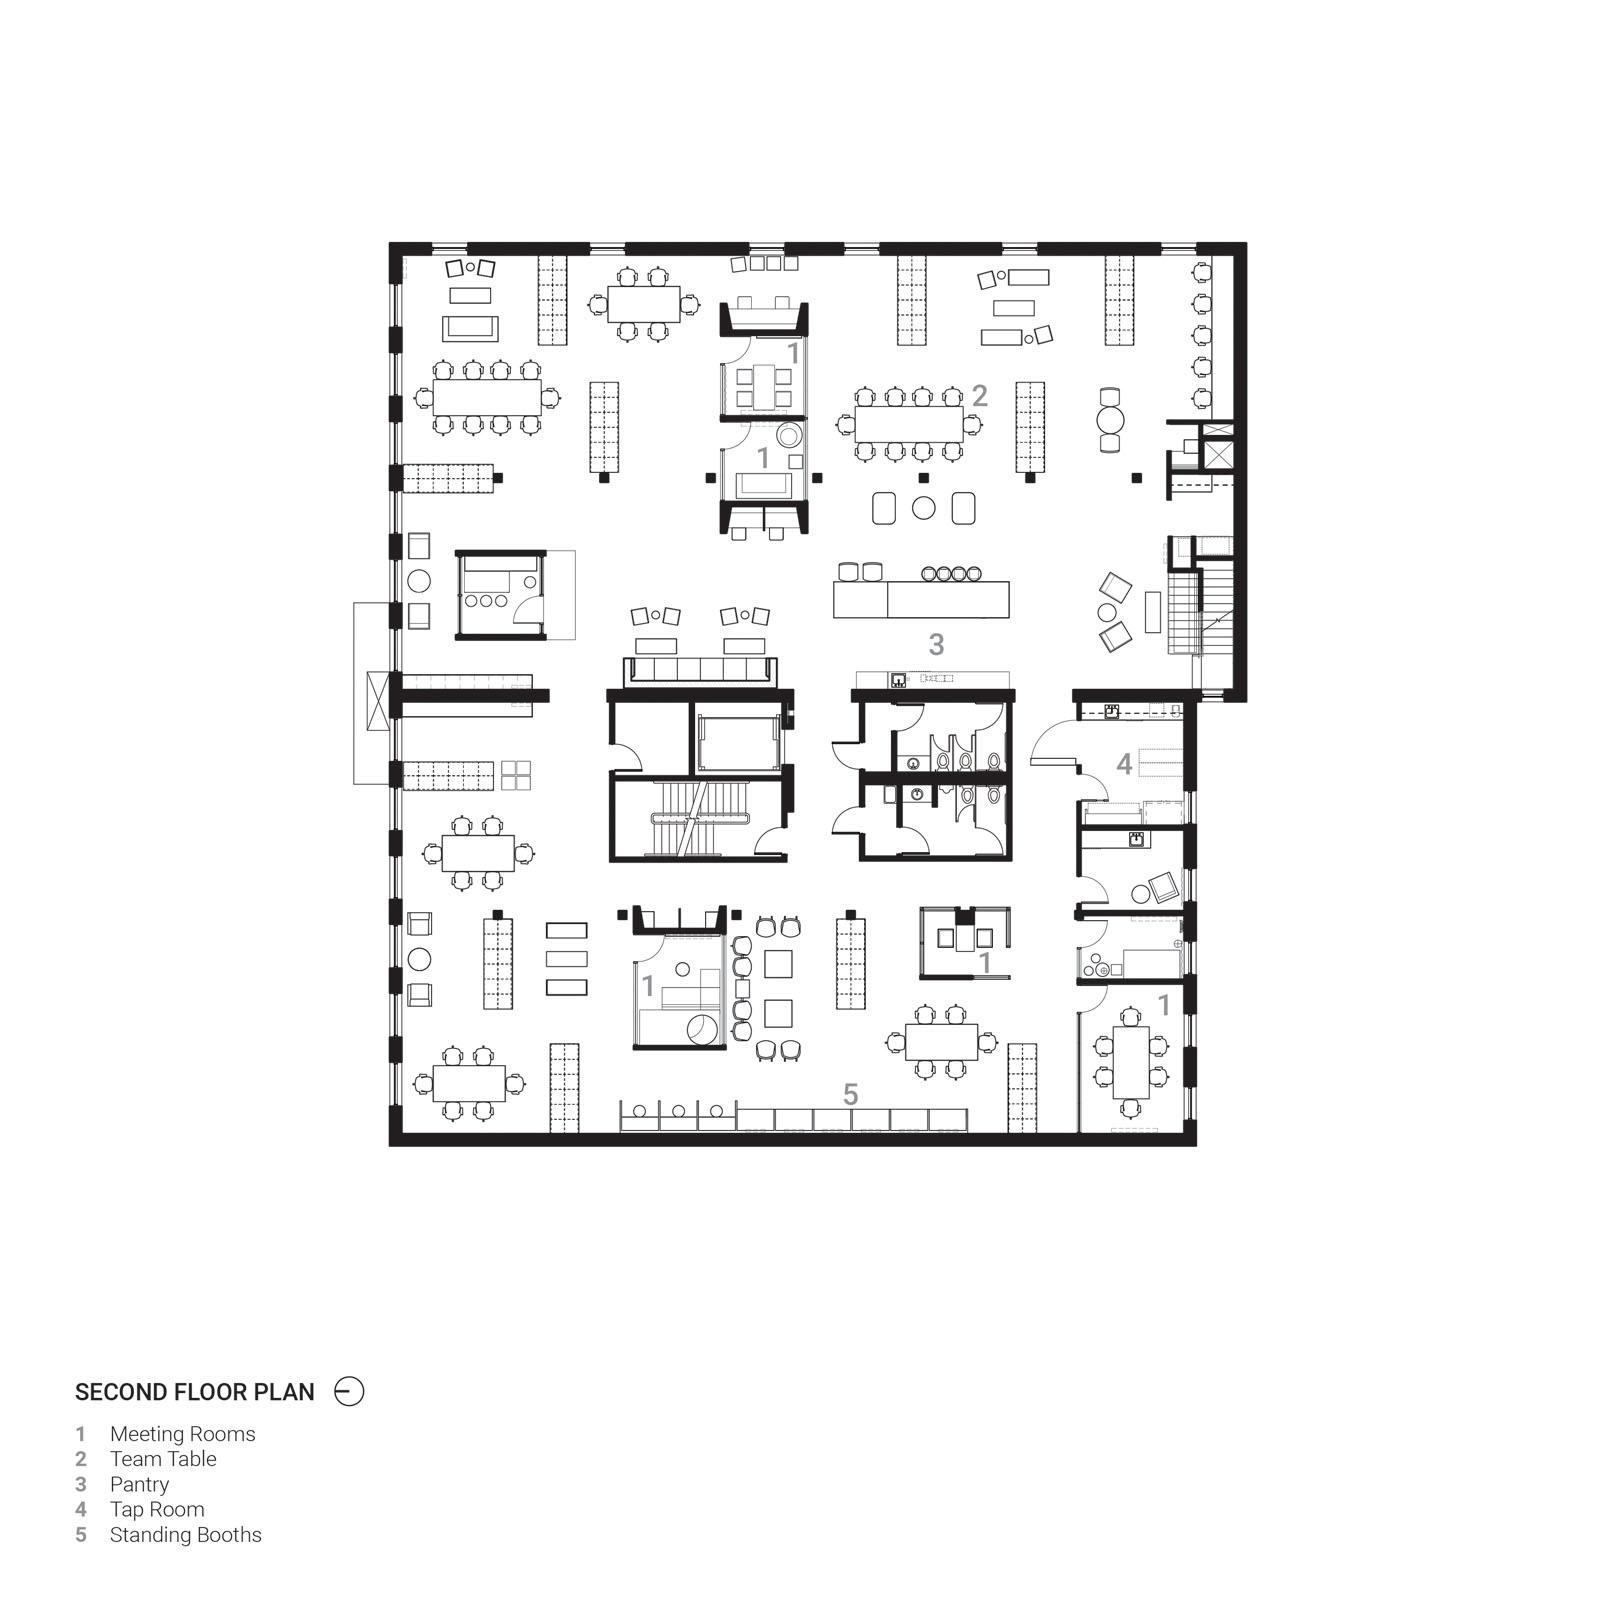 bora_second floor.jpg